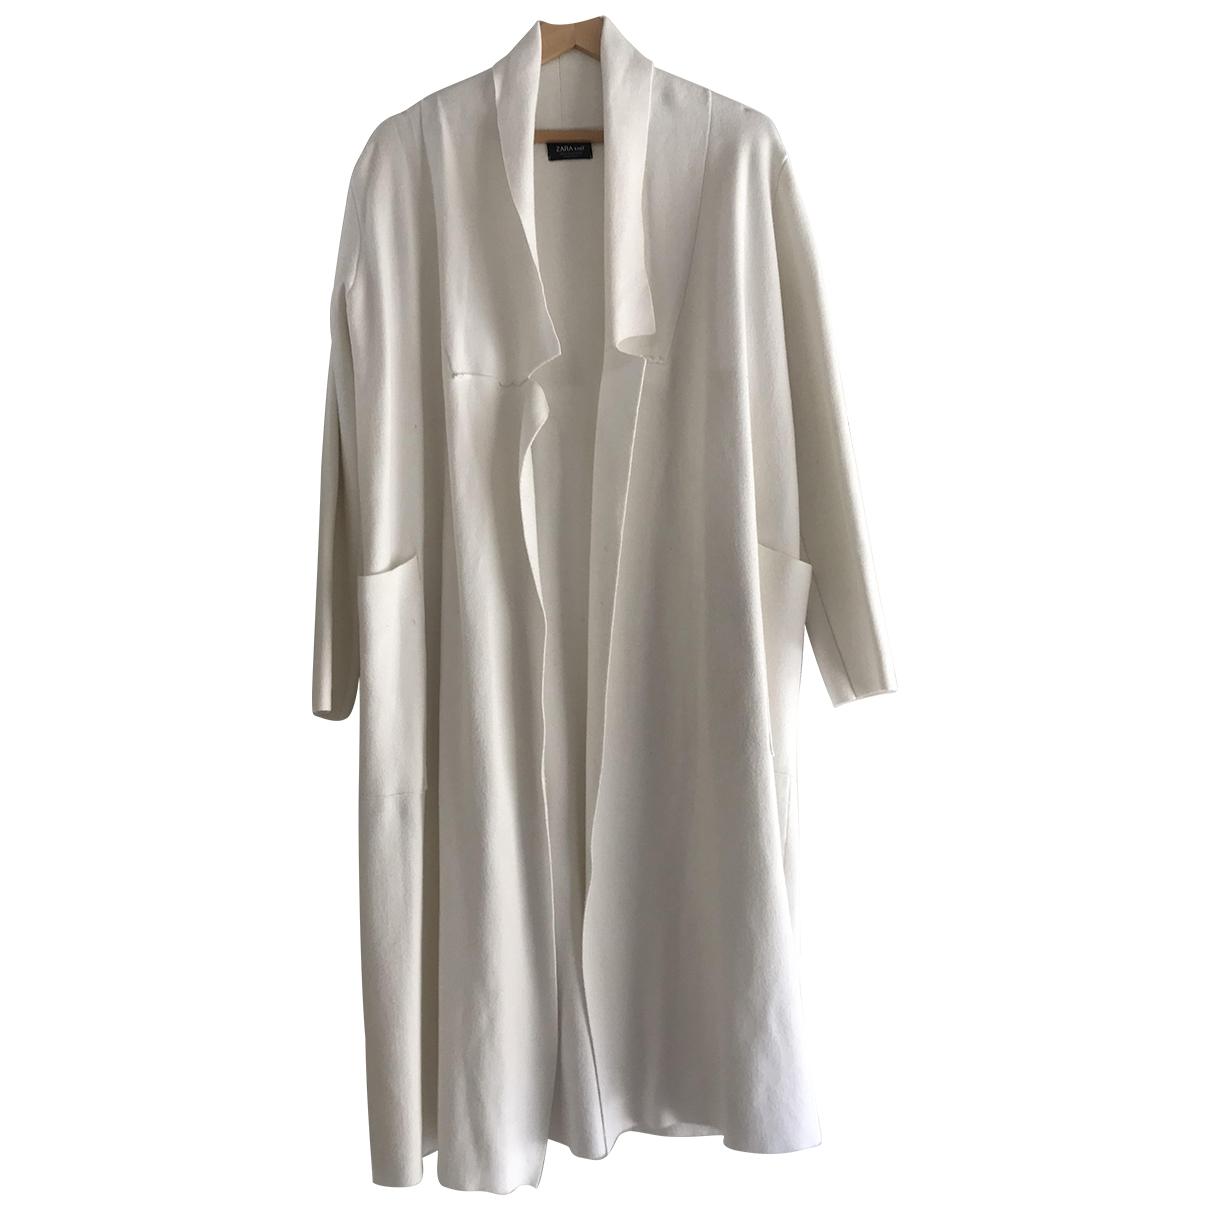 Zara \N White Cotton coat for Women M International